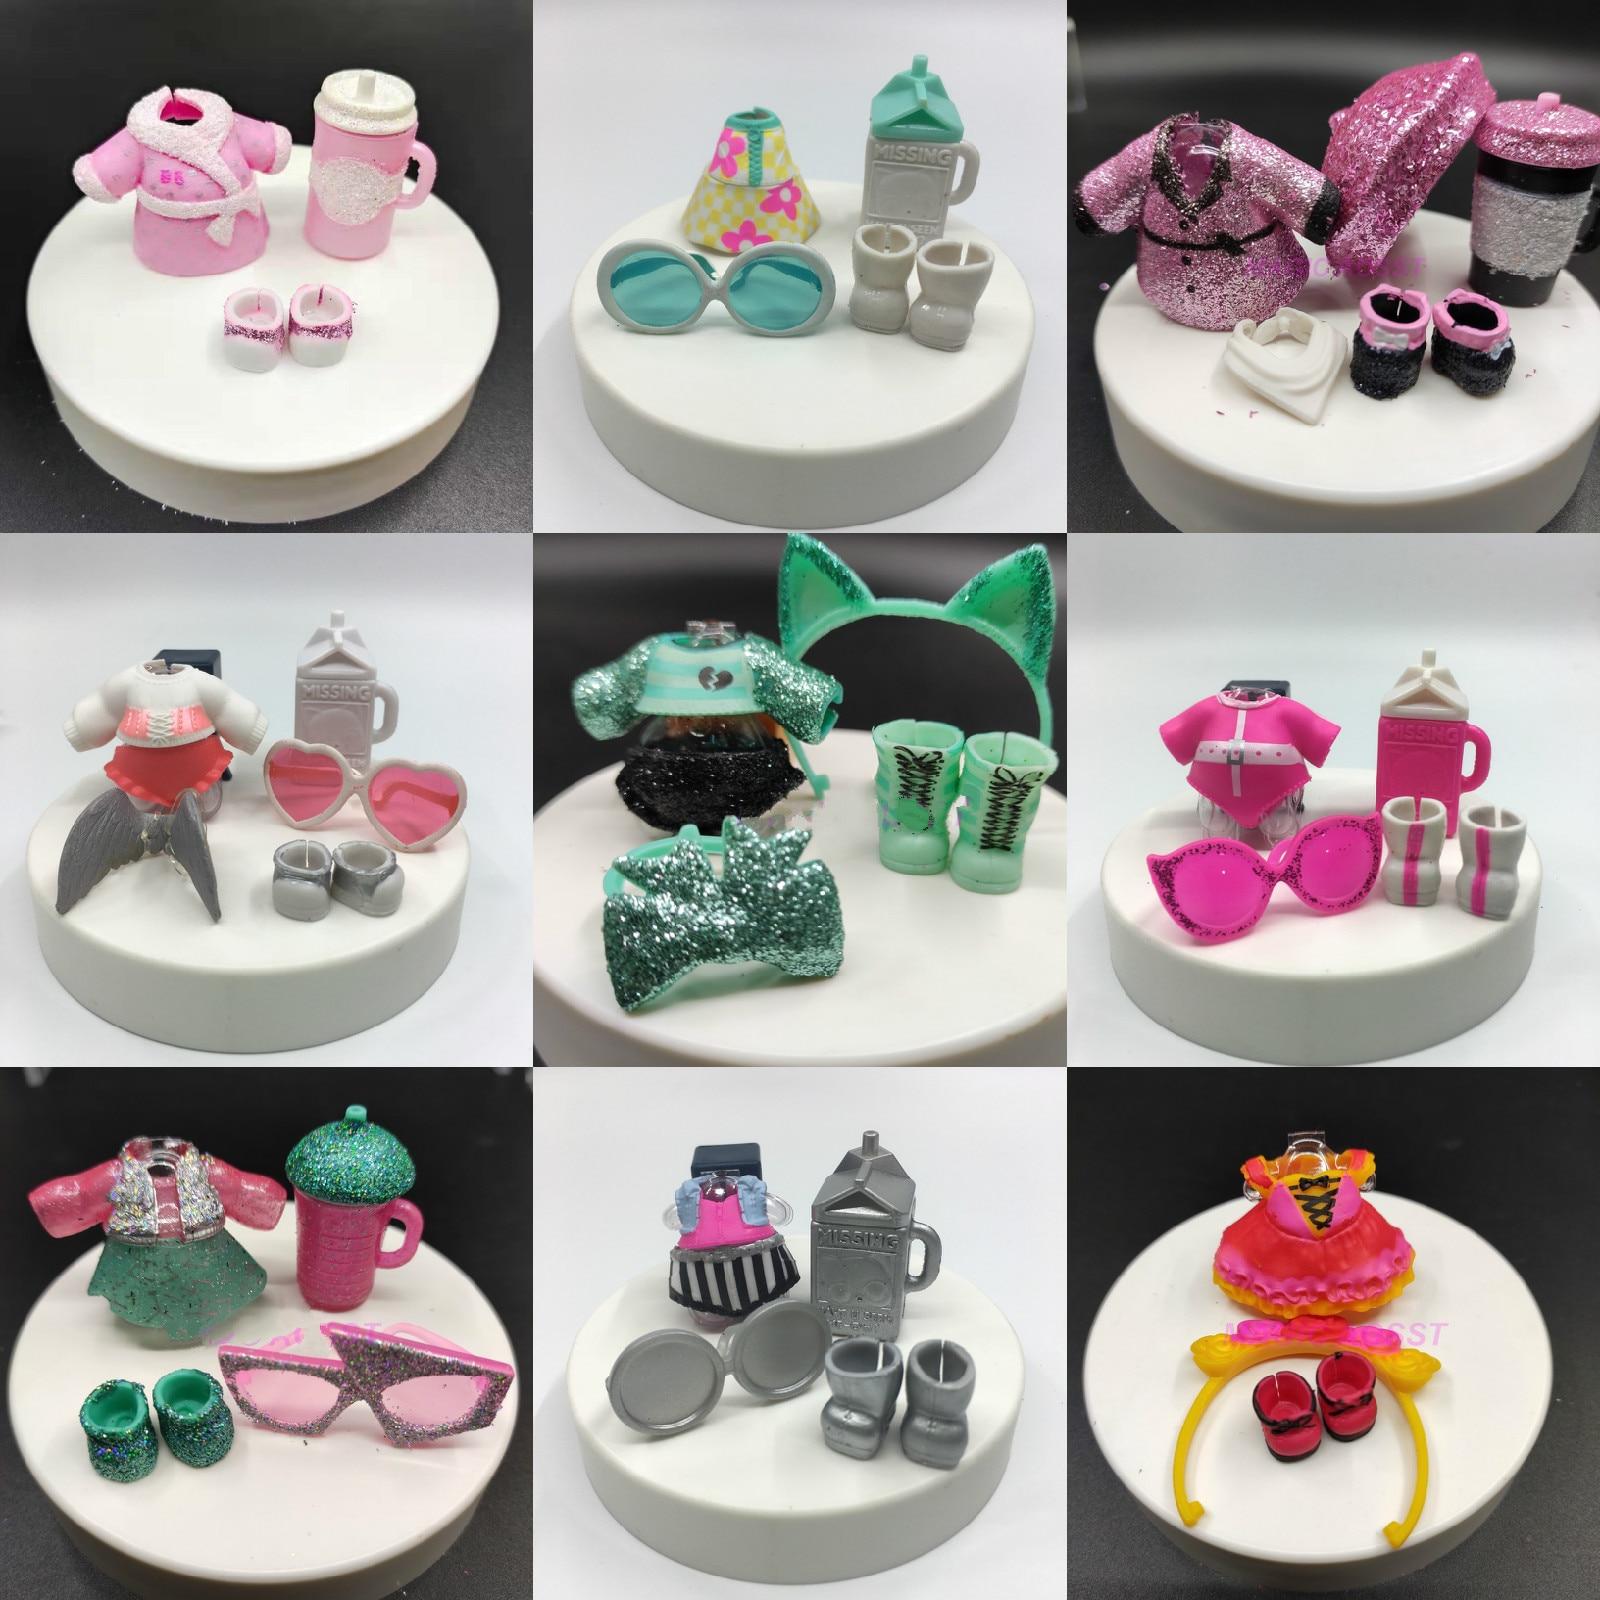 1 Set LOL Doll Clothes Glasses Bottle Shoes Accessorries Lol Accessories On Sale Original LOL Dolls Collection Drop